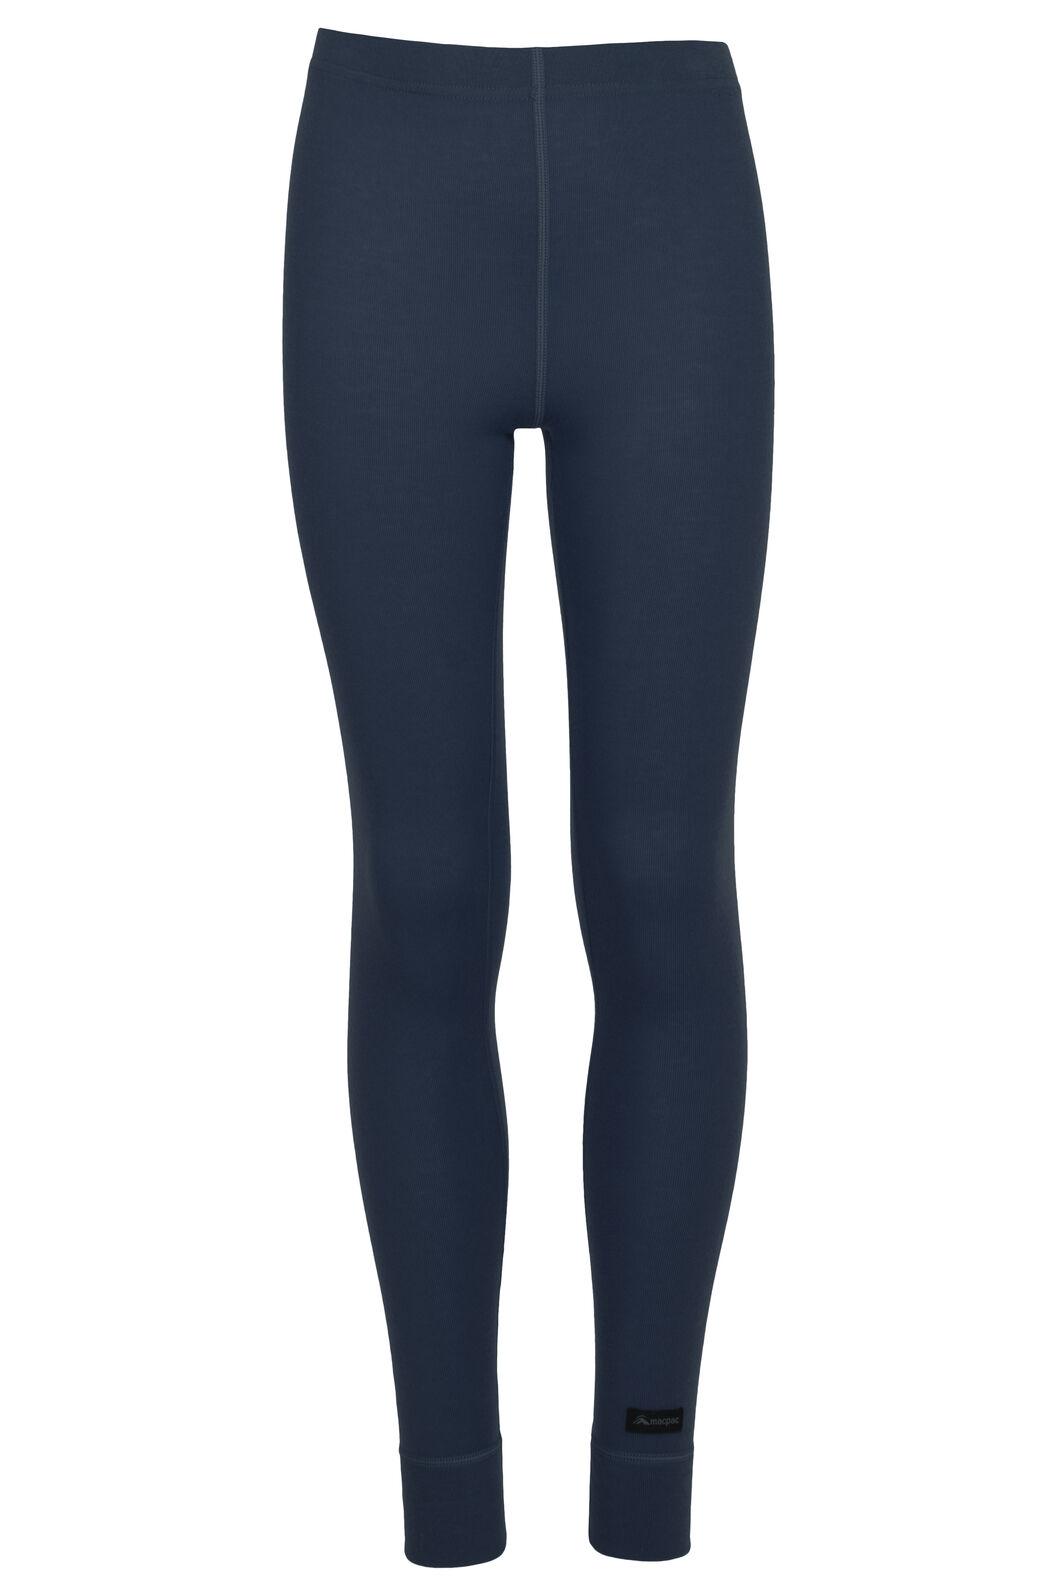 Macpac Geothermal Pants - Kids', Dress Blue, hi-res